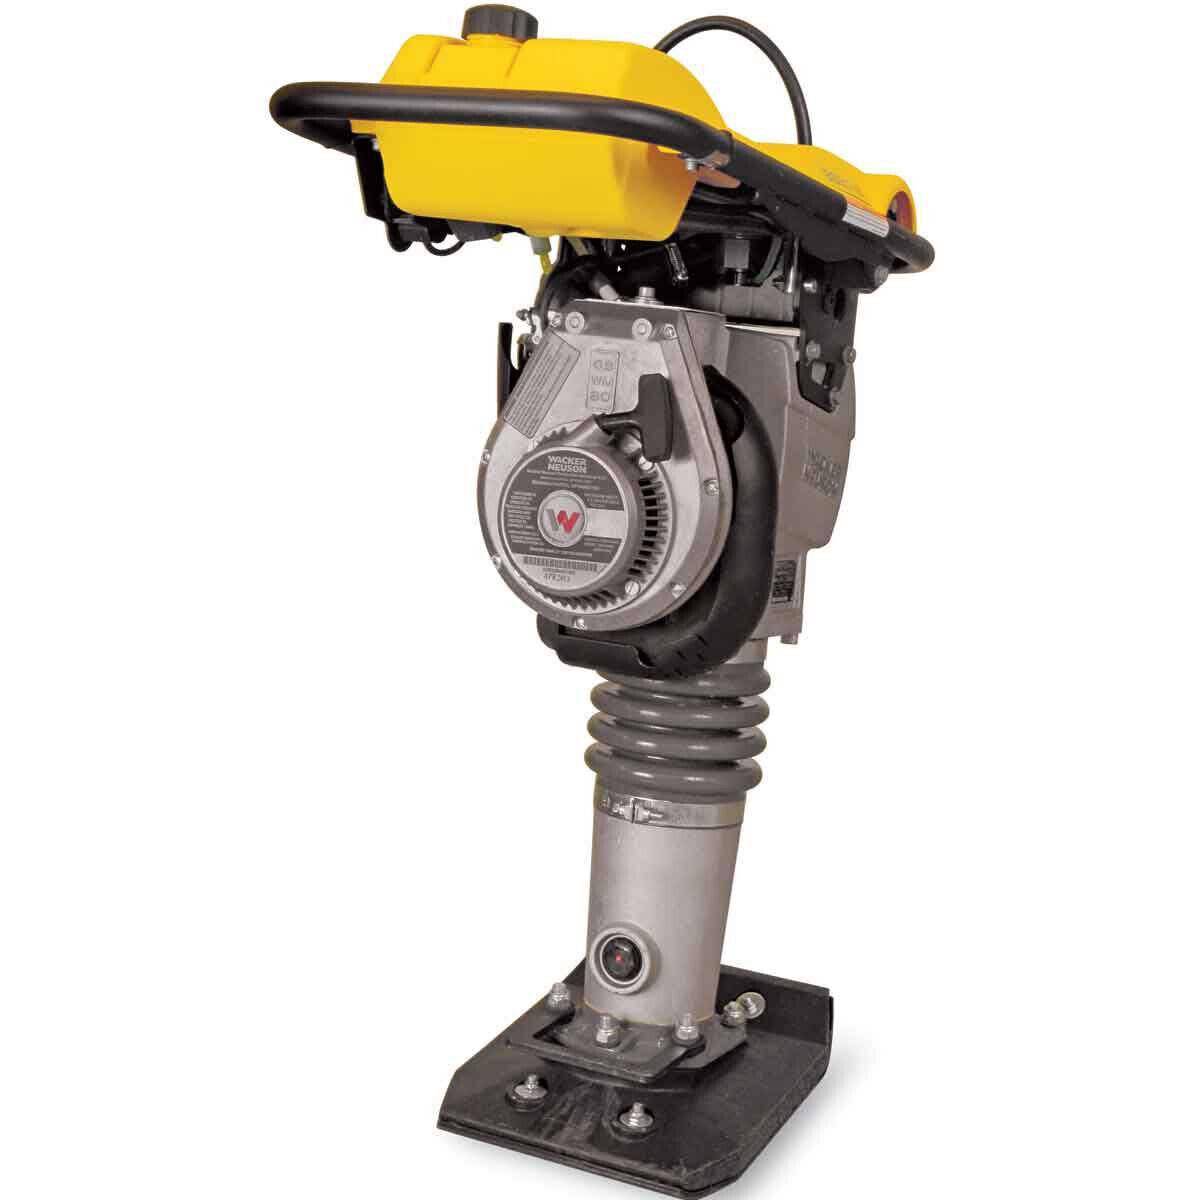 Wacker Neuson Oil-Injected Rammer Motor